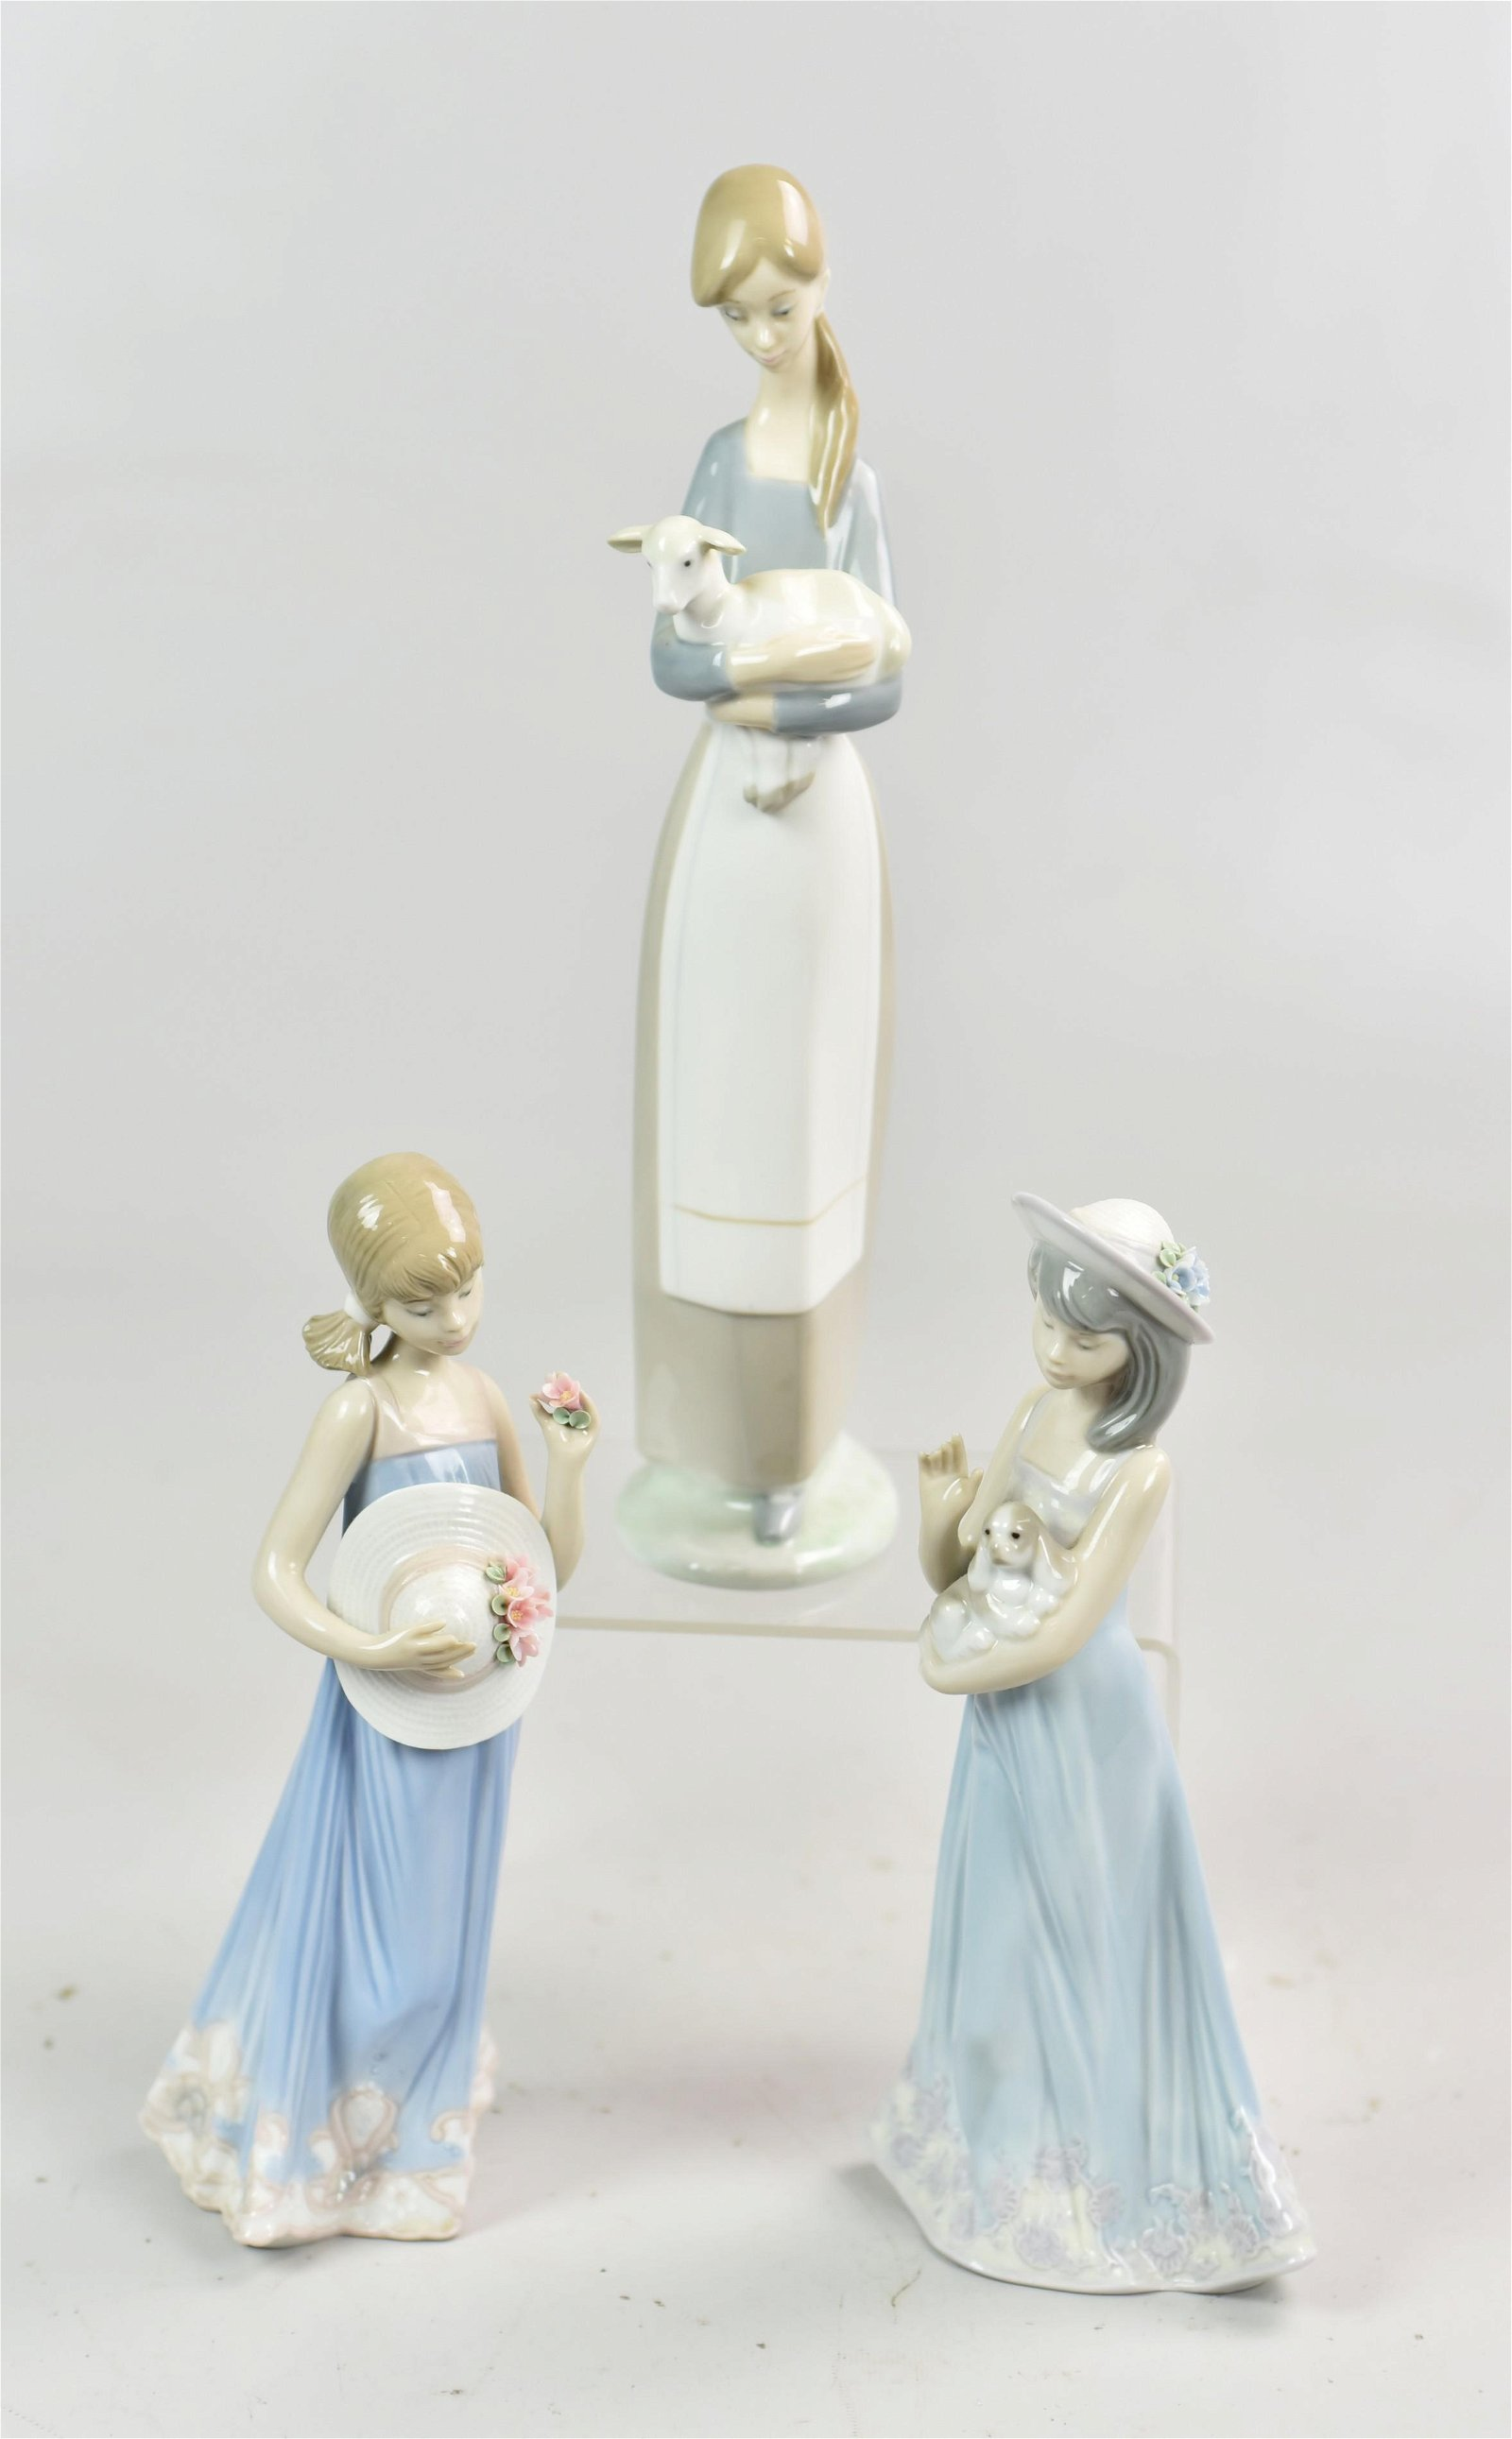 (3) Lladro Porcelain Figures